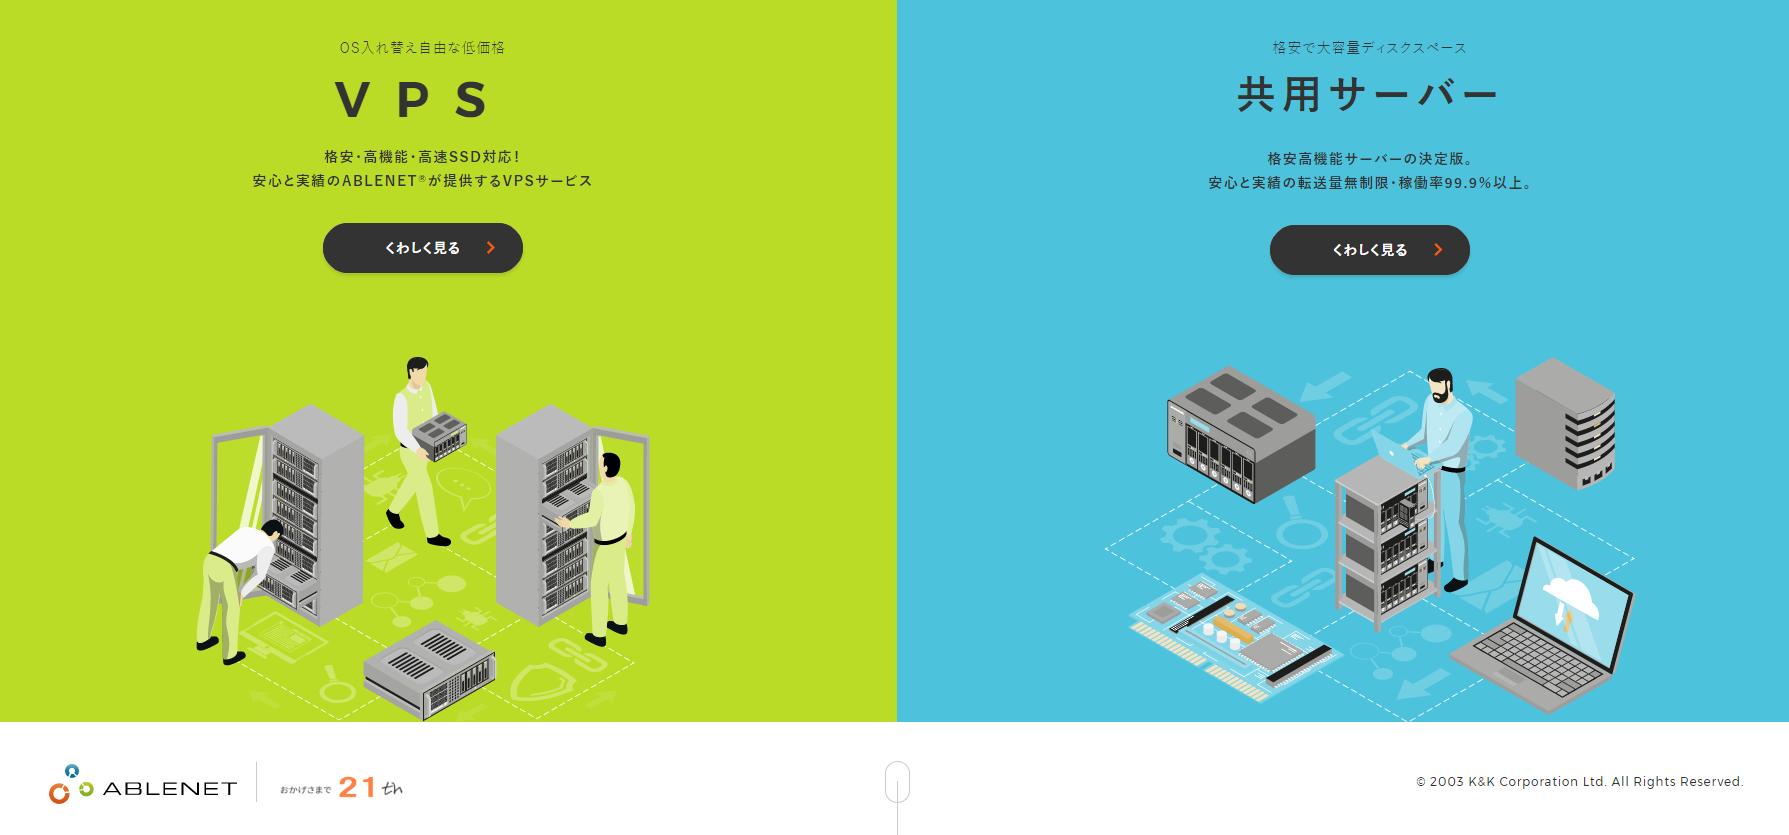 ABLENET - 【決定版】FX自動売買 おすすめVPS 徹底比較!